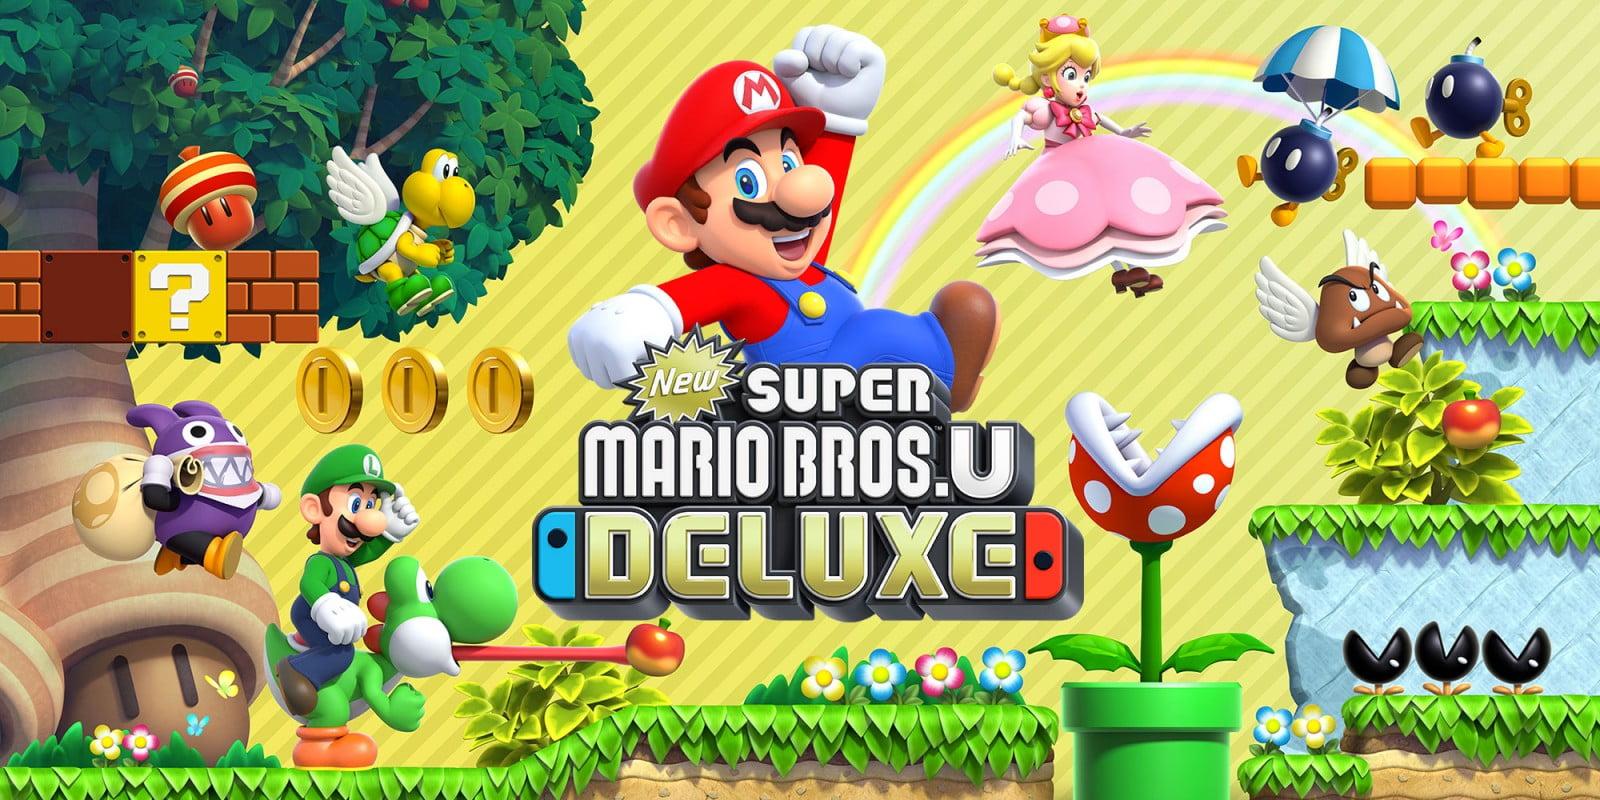 Photo of Nintendo Releases New Super Mario Bros. U Deluxe Launch Trailer to Celebrate Release